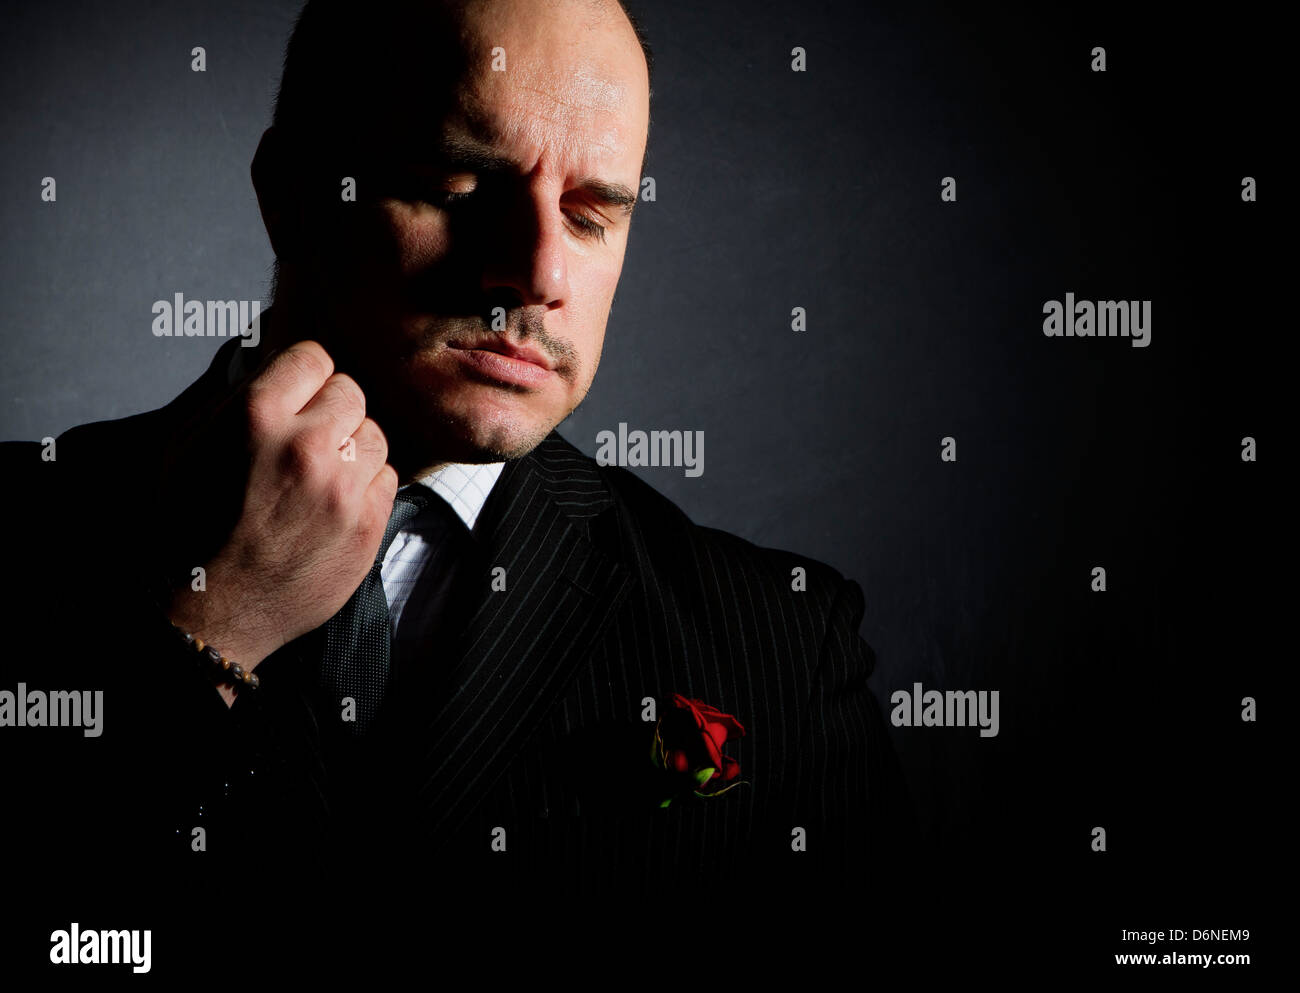 Portrait of man, godfather-like character. - Stock Image